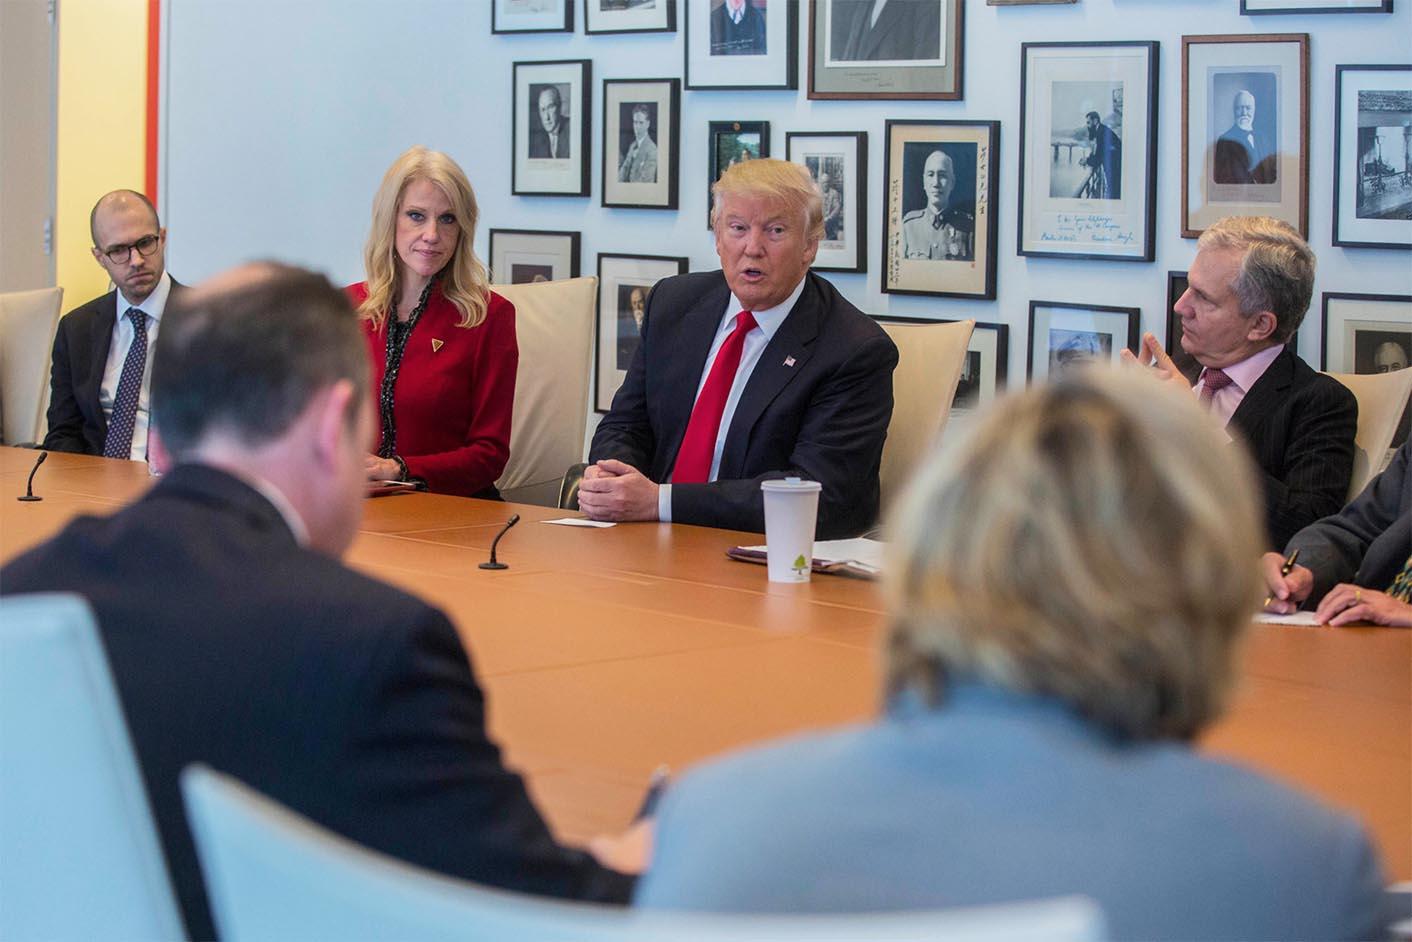 Donald Trump New York Times Interview